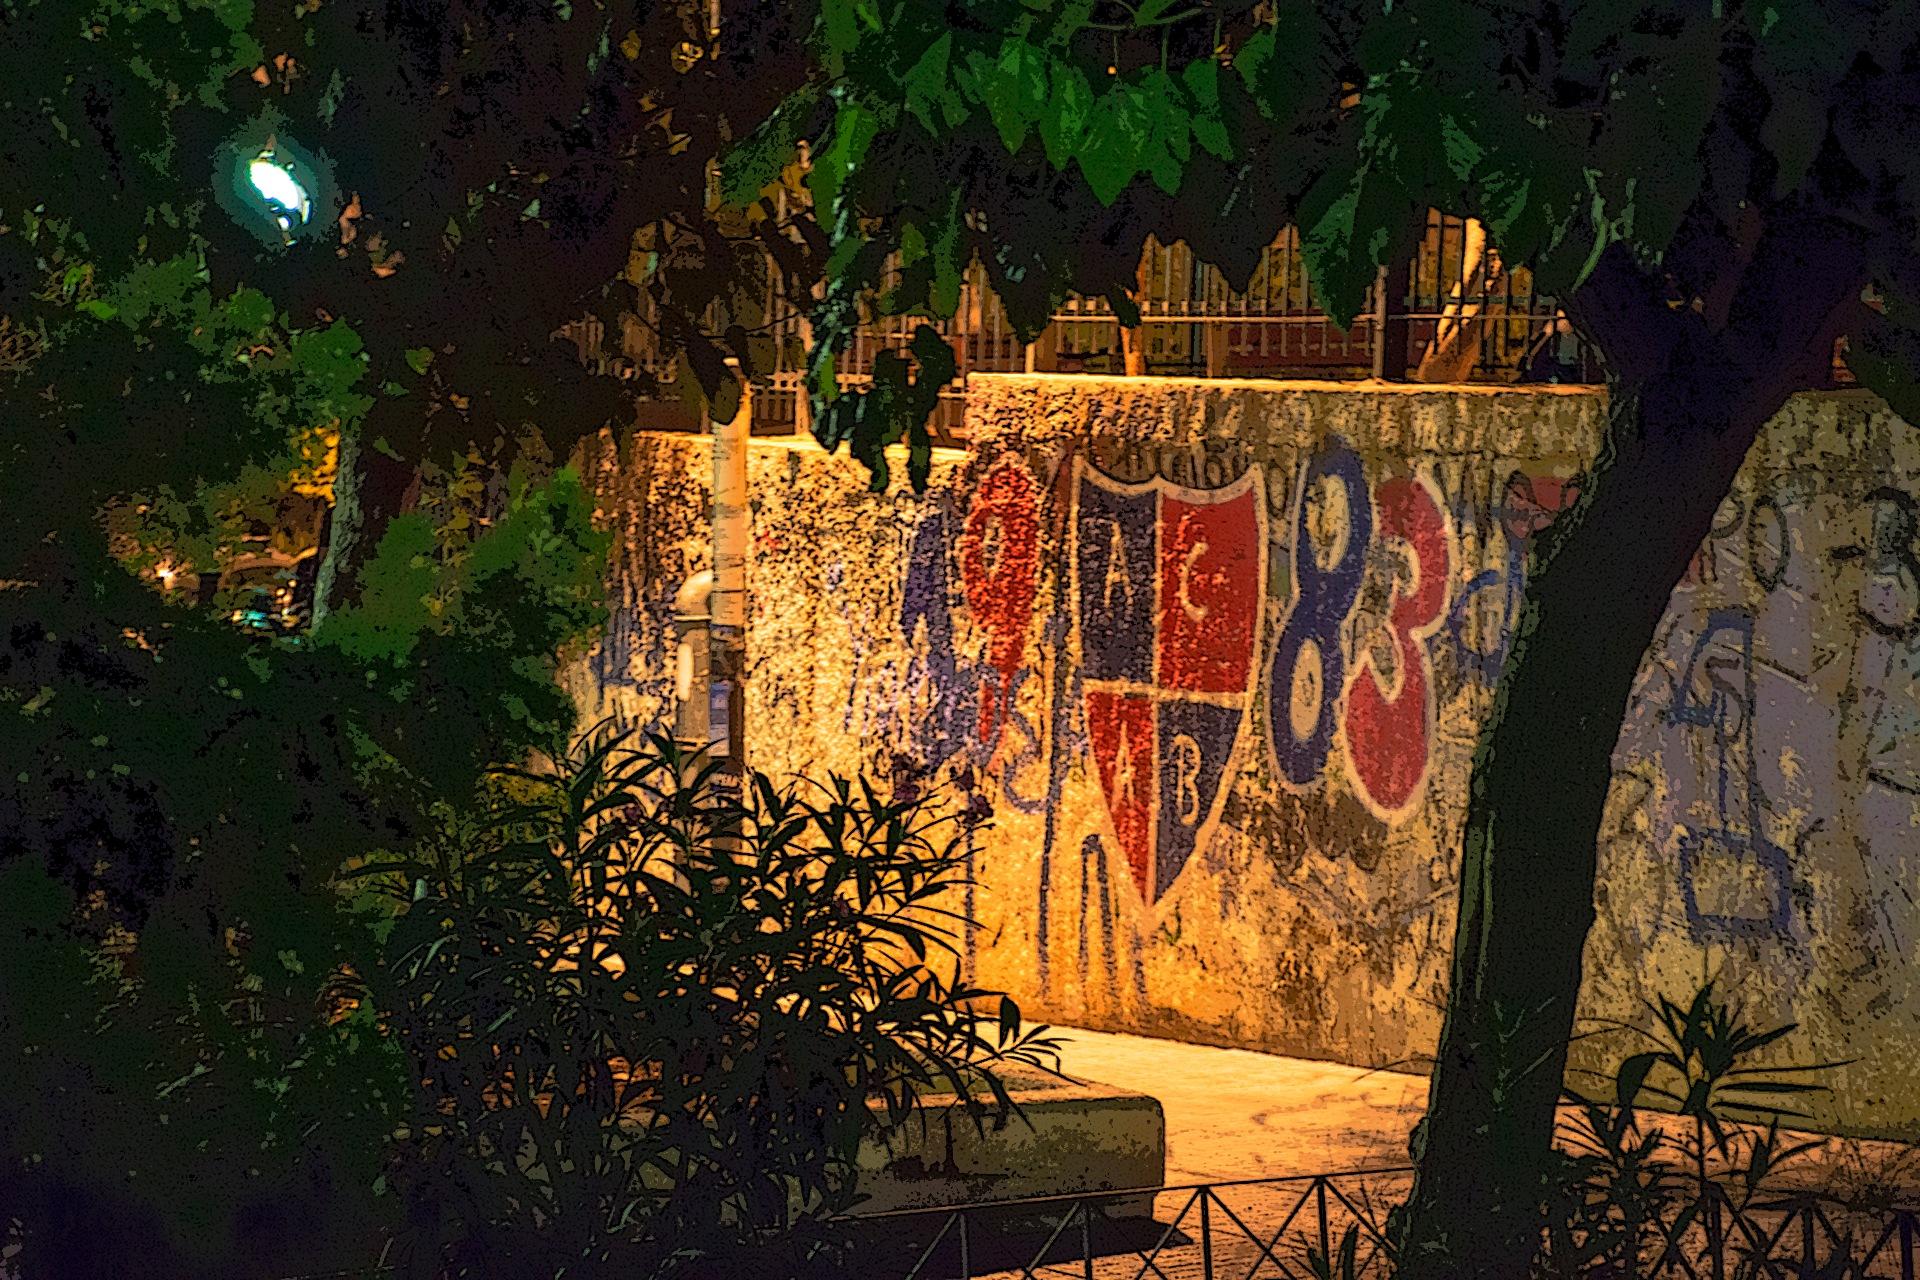 night walk #4 by Alexandros C